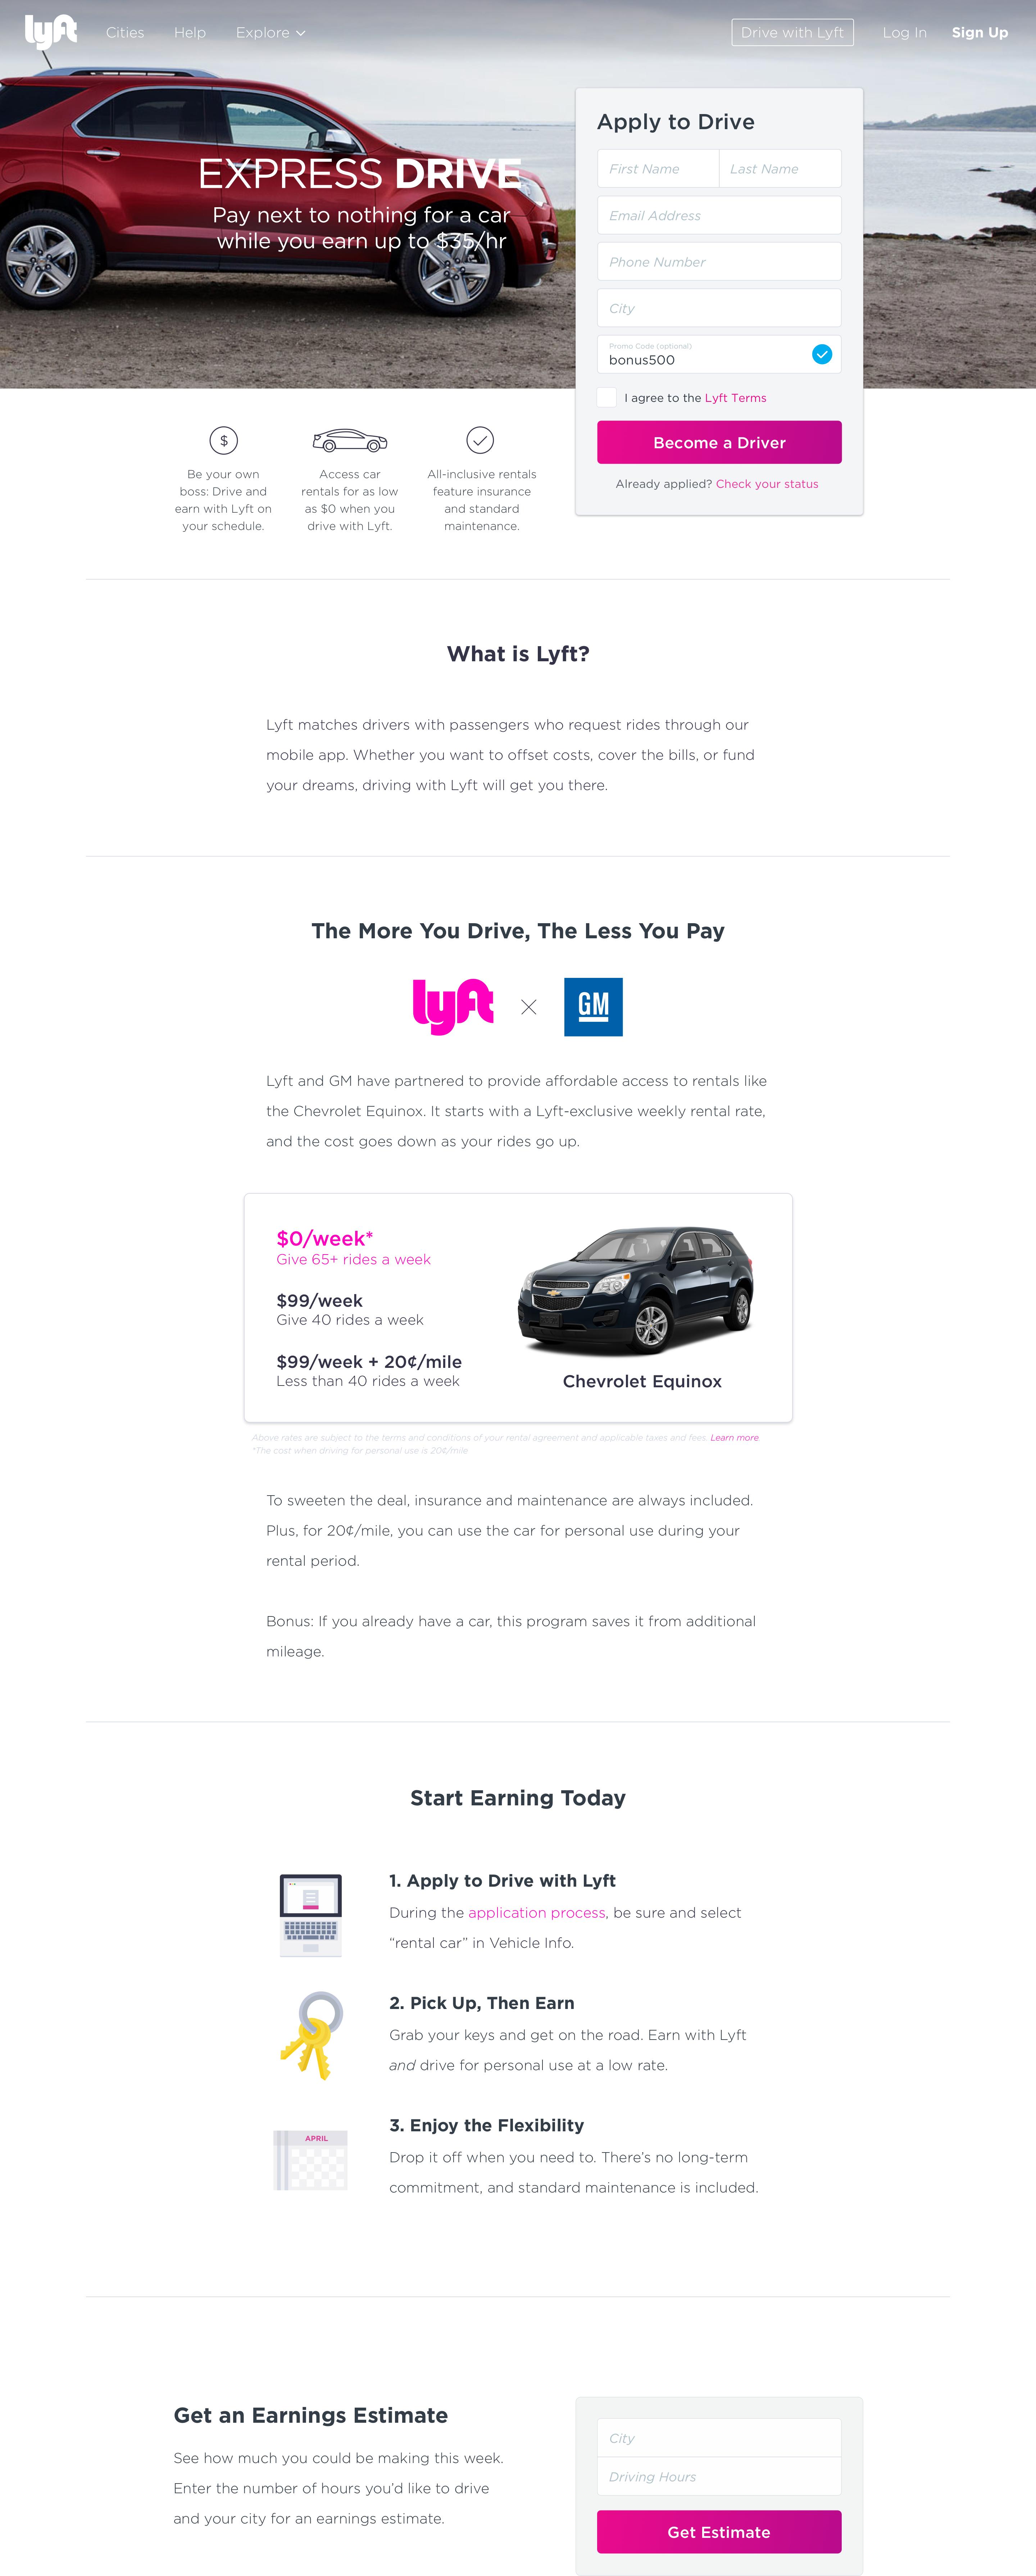 Lyft Car Rental >> Lyft And Gm Launch Express Drive Program